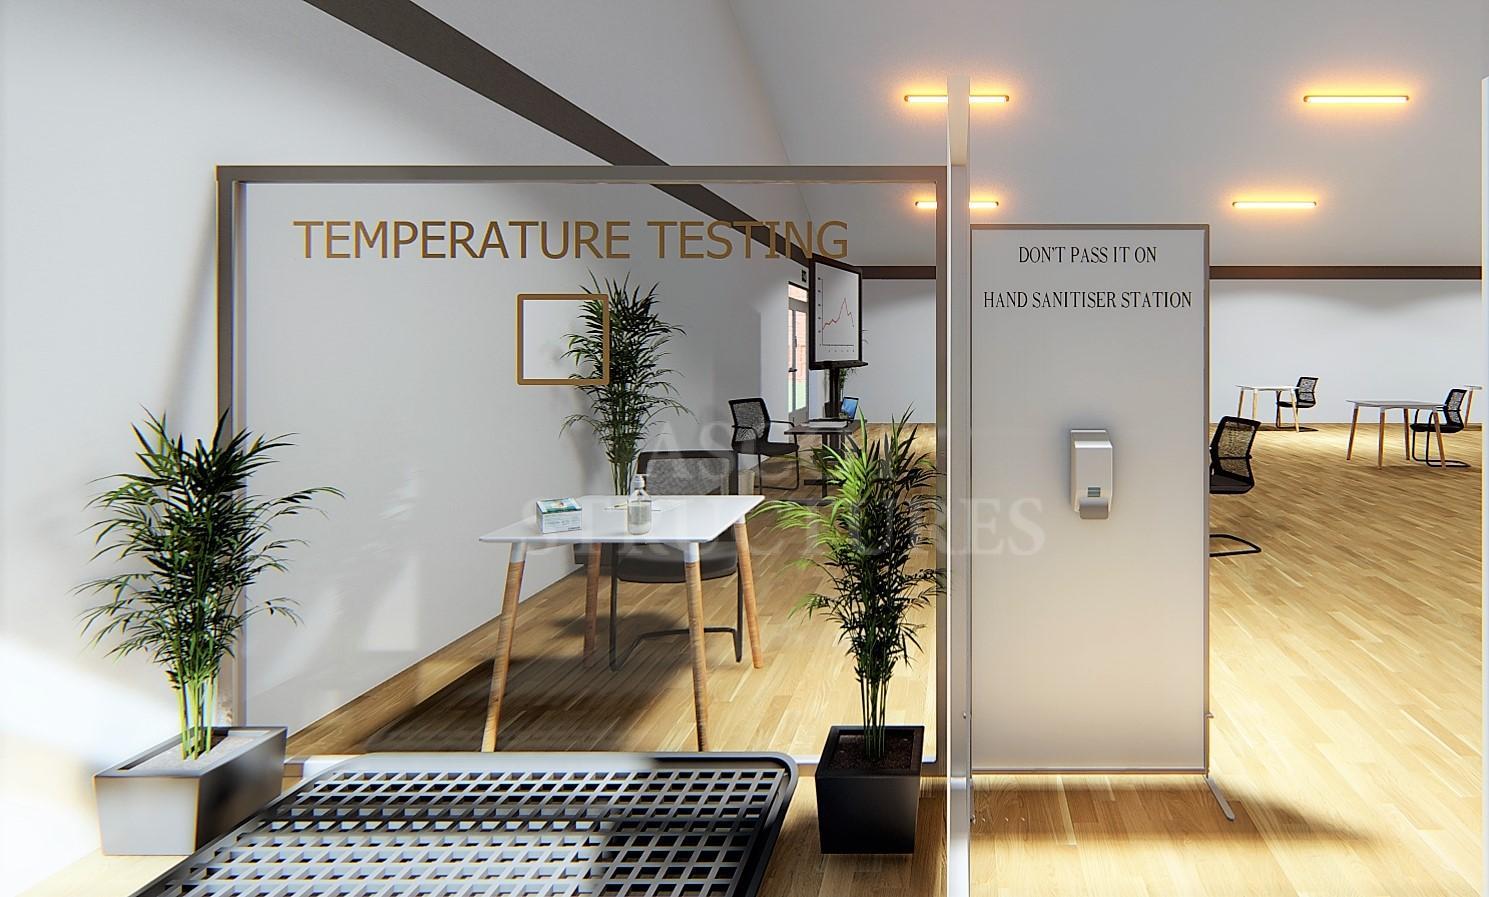 Temperature testing station